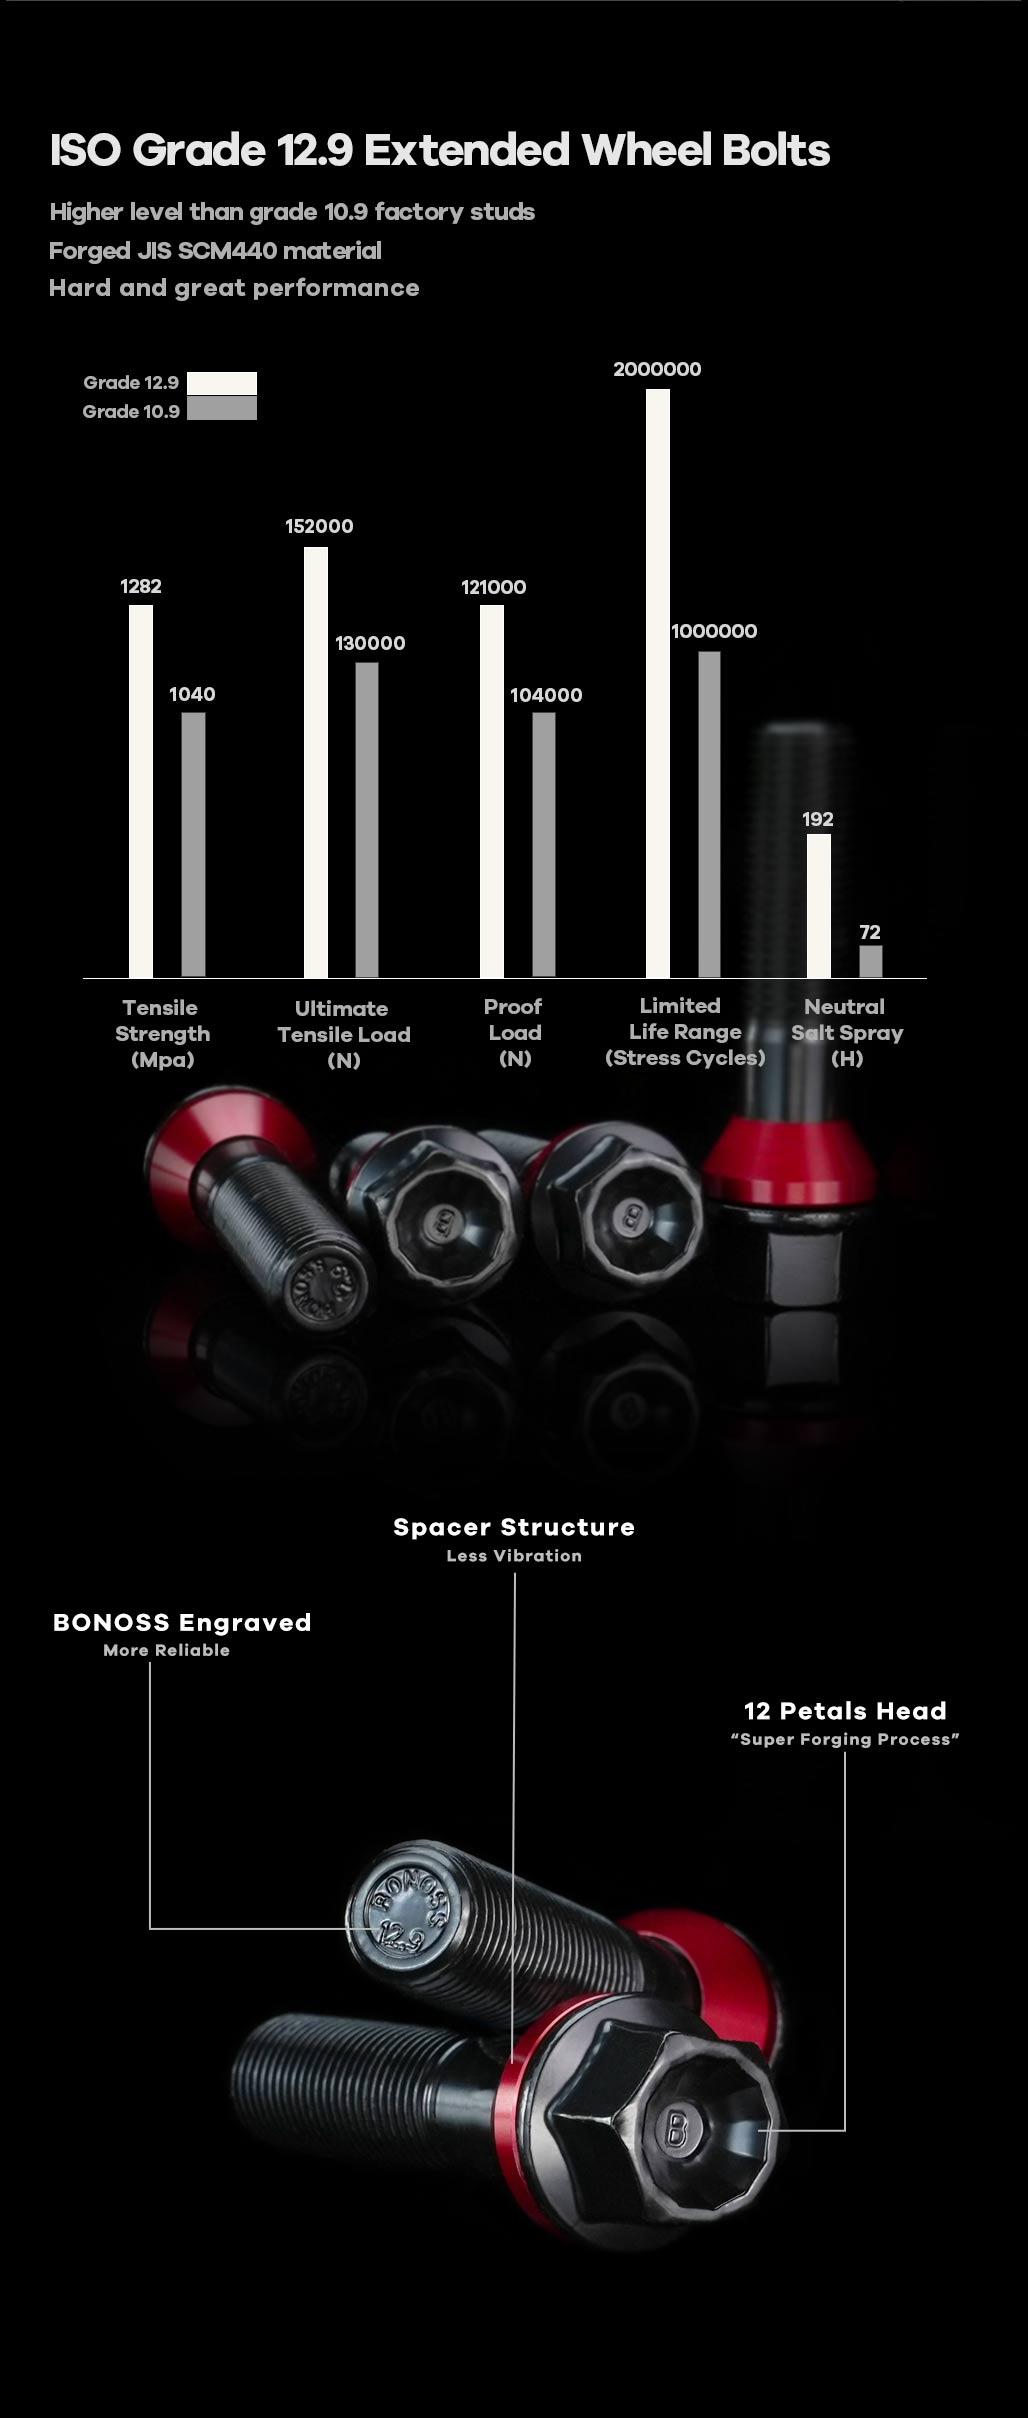 BONOSS-forged-lightweight-plus-4-Lugs-wheel-spacers-by-lulu-4